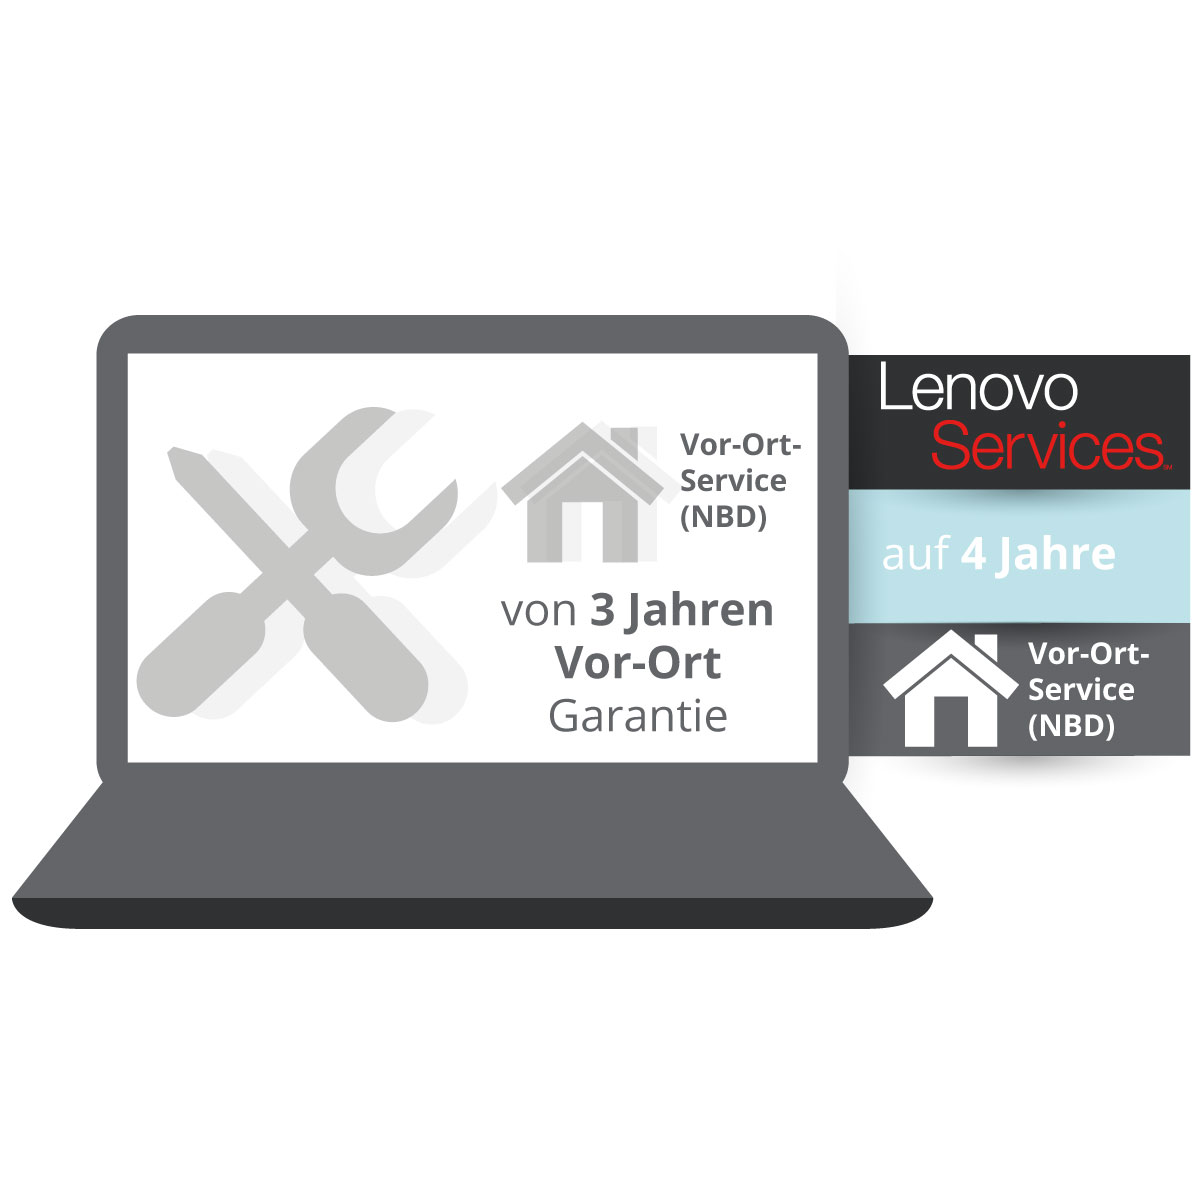 lenovo garantie upgrade 3 jahre vor ort service auf 4. Black Bedroom Furniture Sets. Home Design Ideas